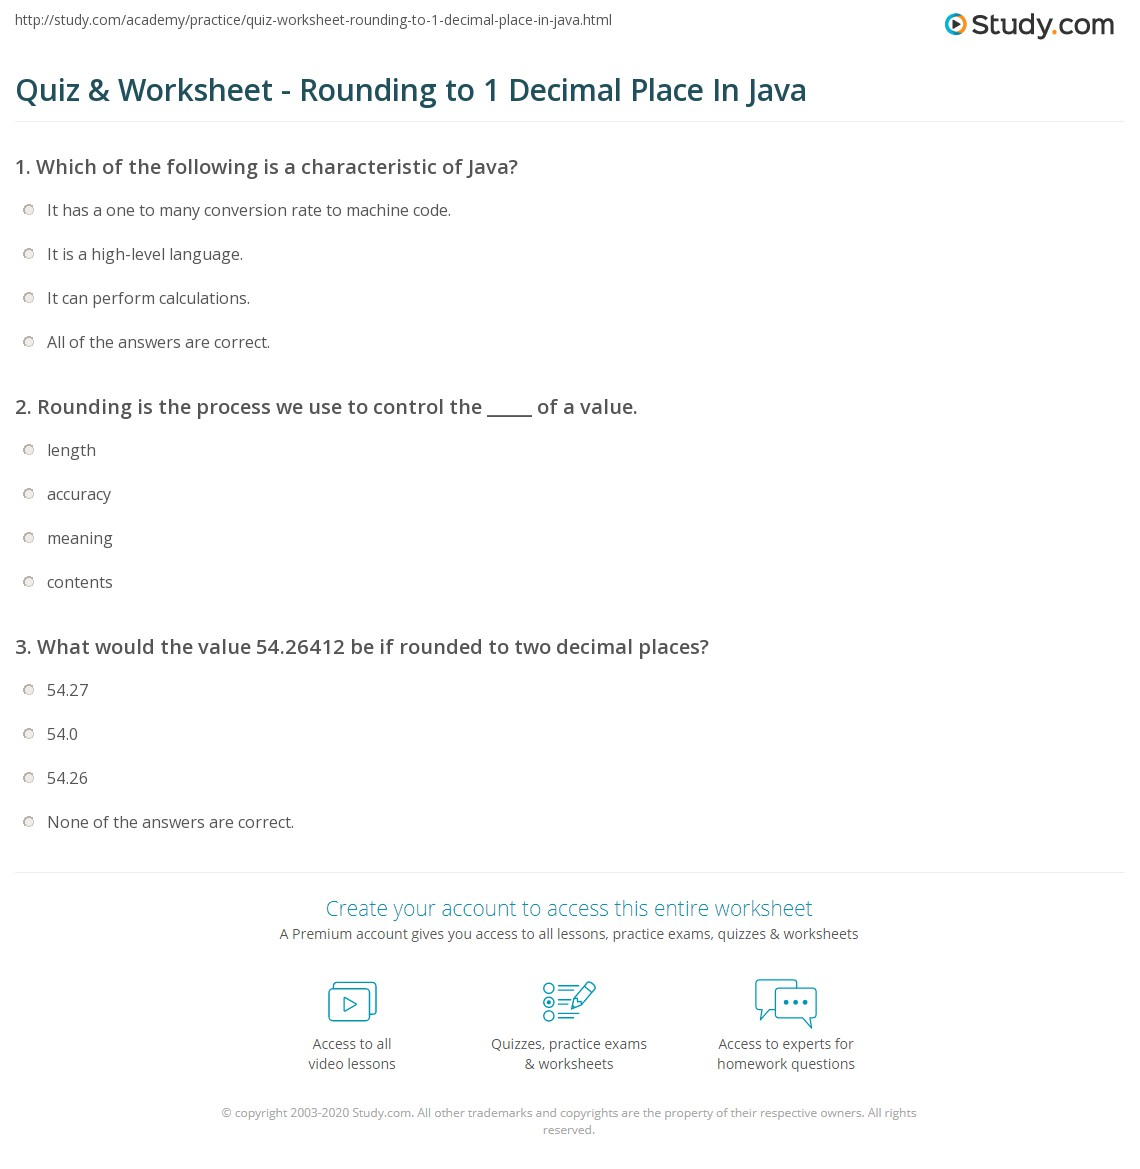 worksheet Rounding To 1 Decimal Place Worksheet quiz worksheet rounding to 1 decimal place in java study com print round one worksheet